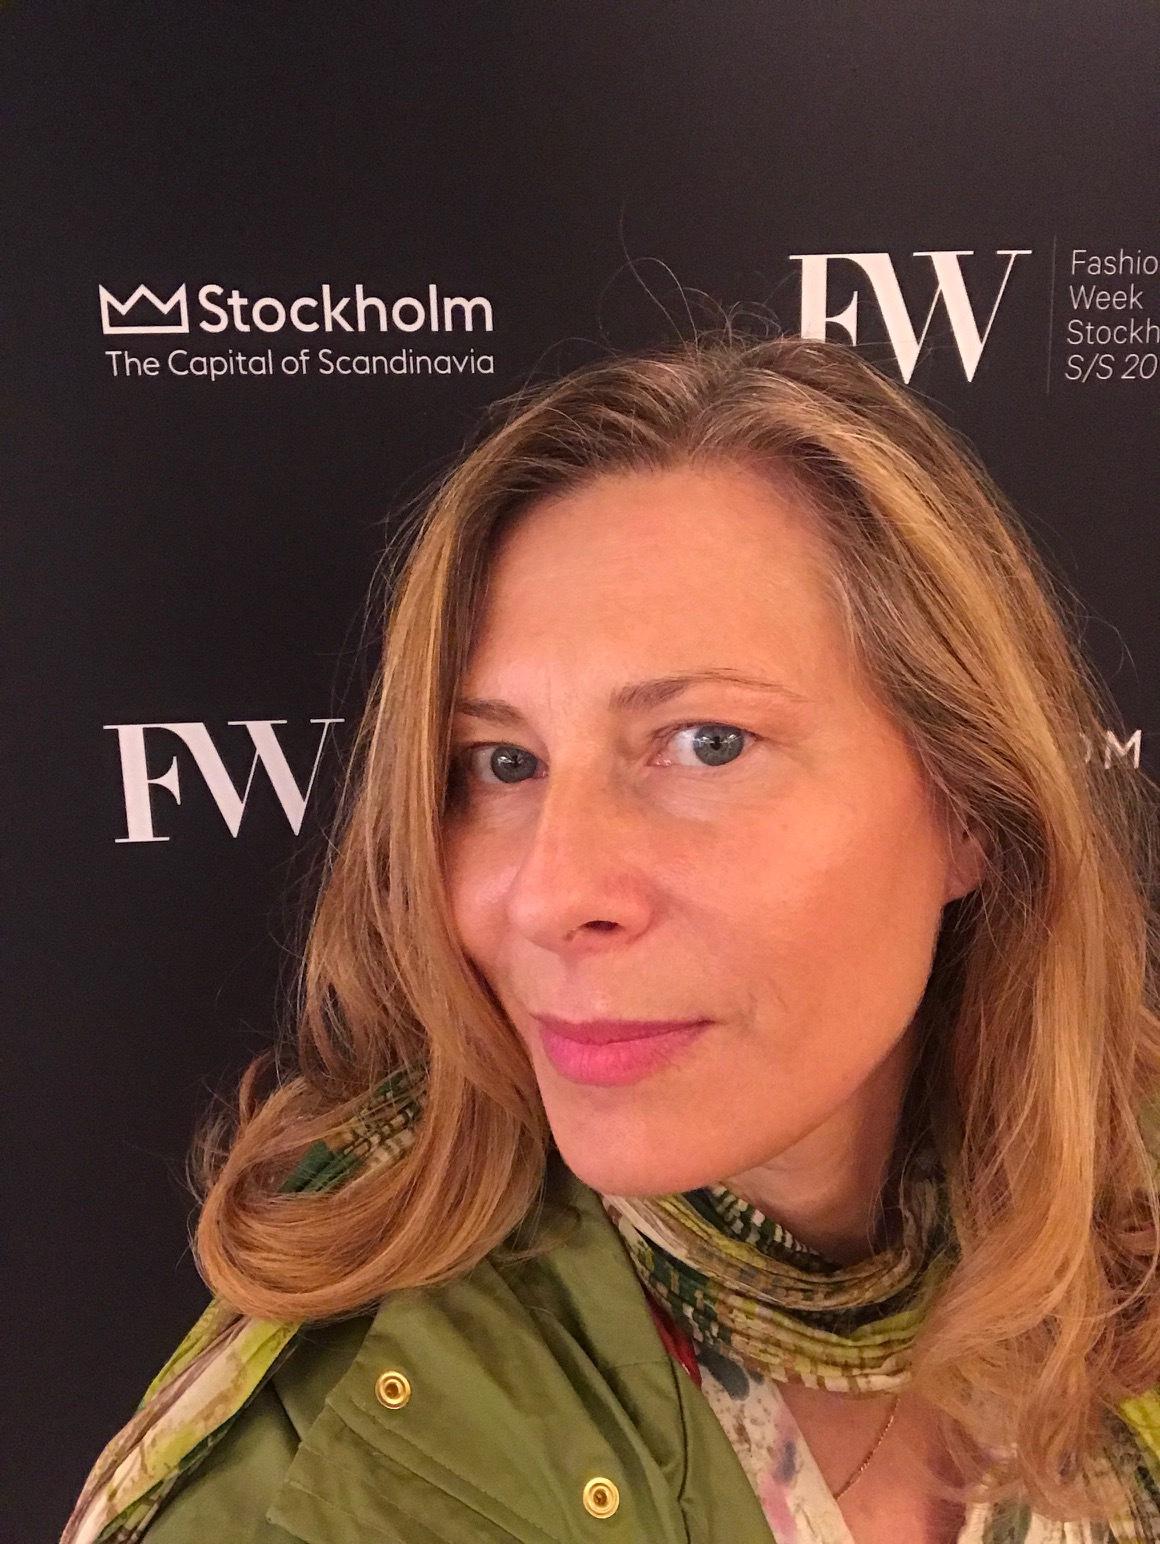 Fashion Week Stockholm, Plats: Grand Hotel. Uppdrag: Testa en Dyson